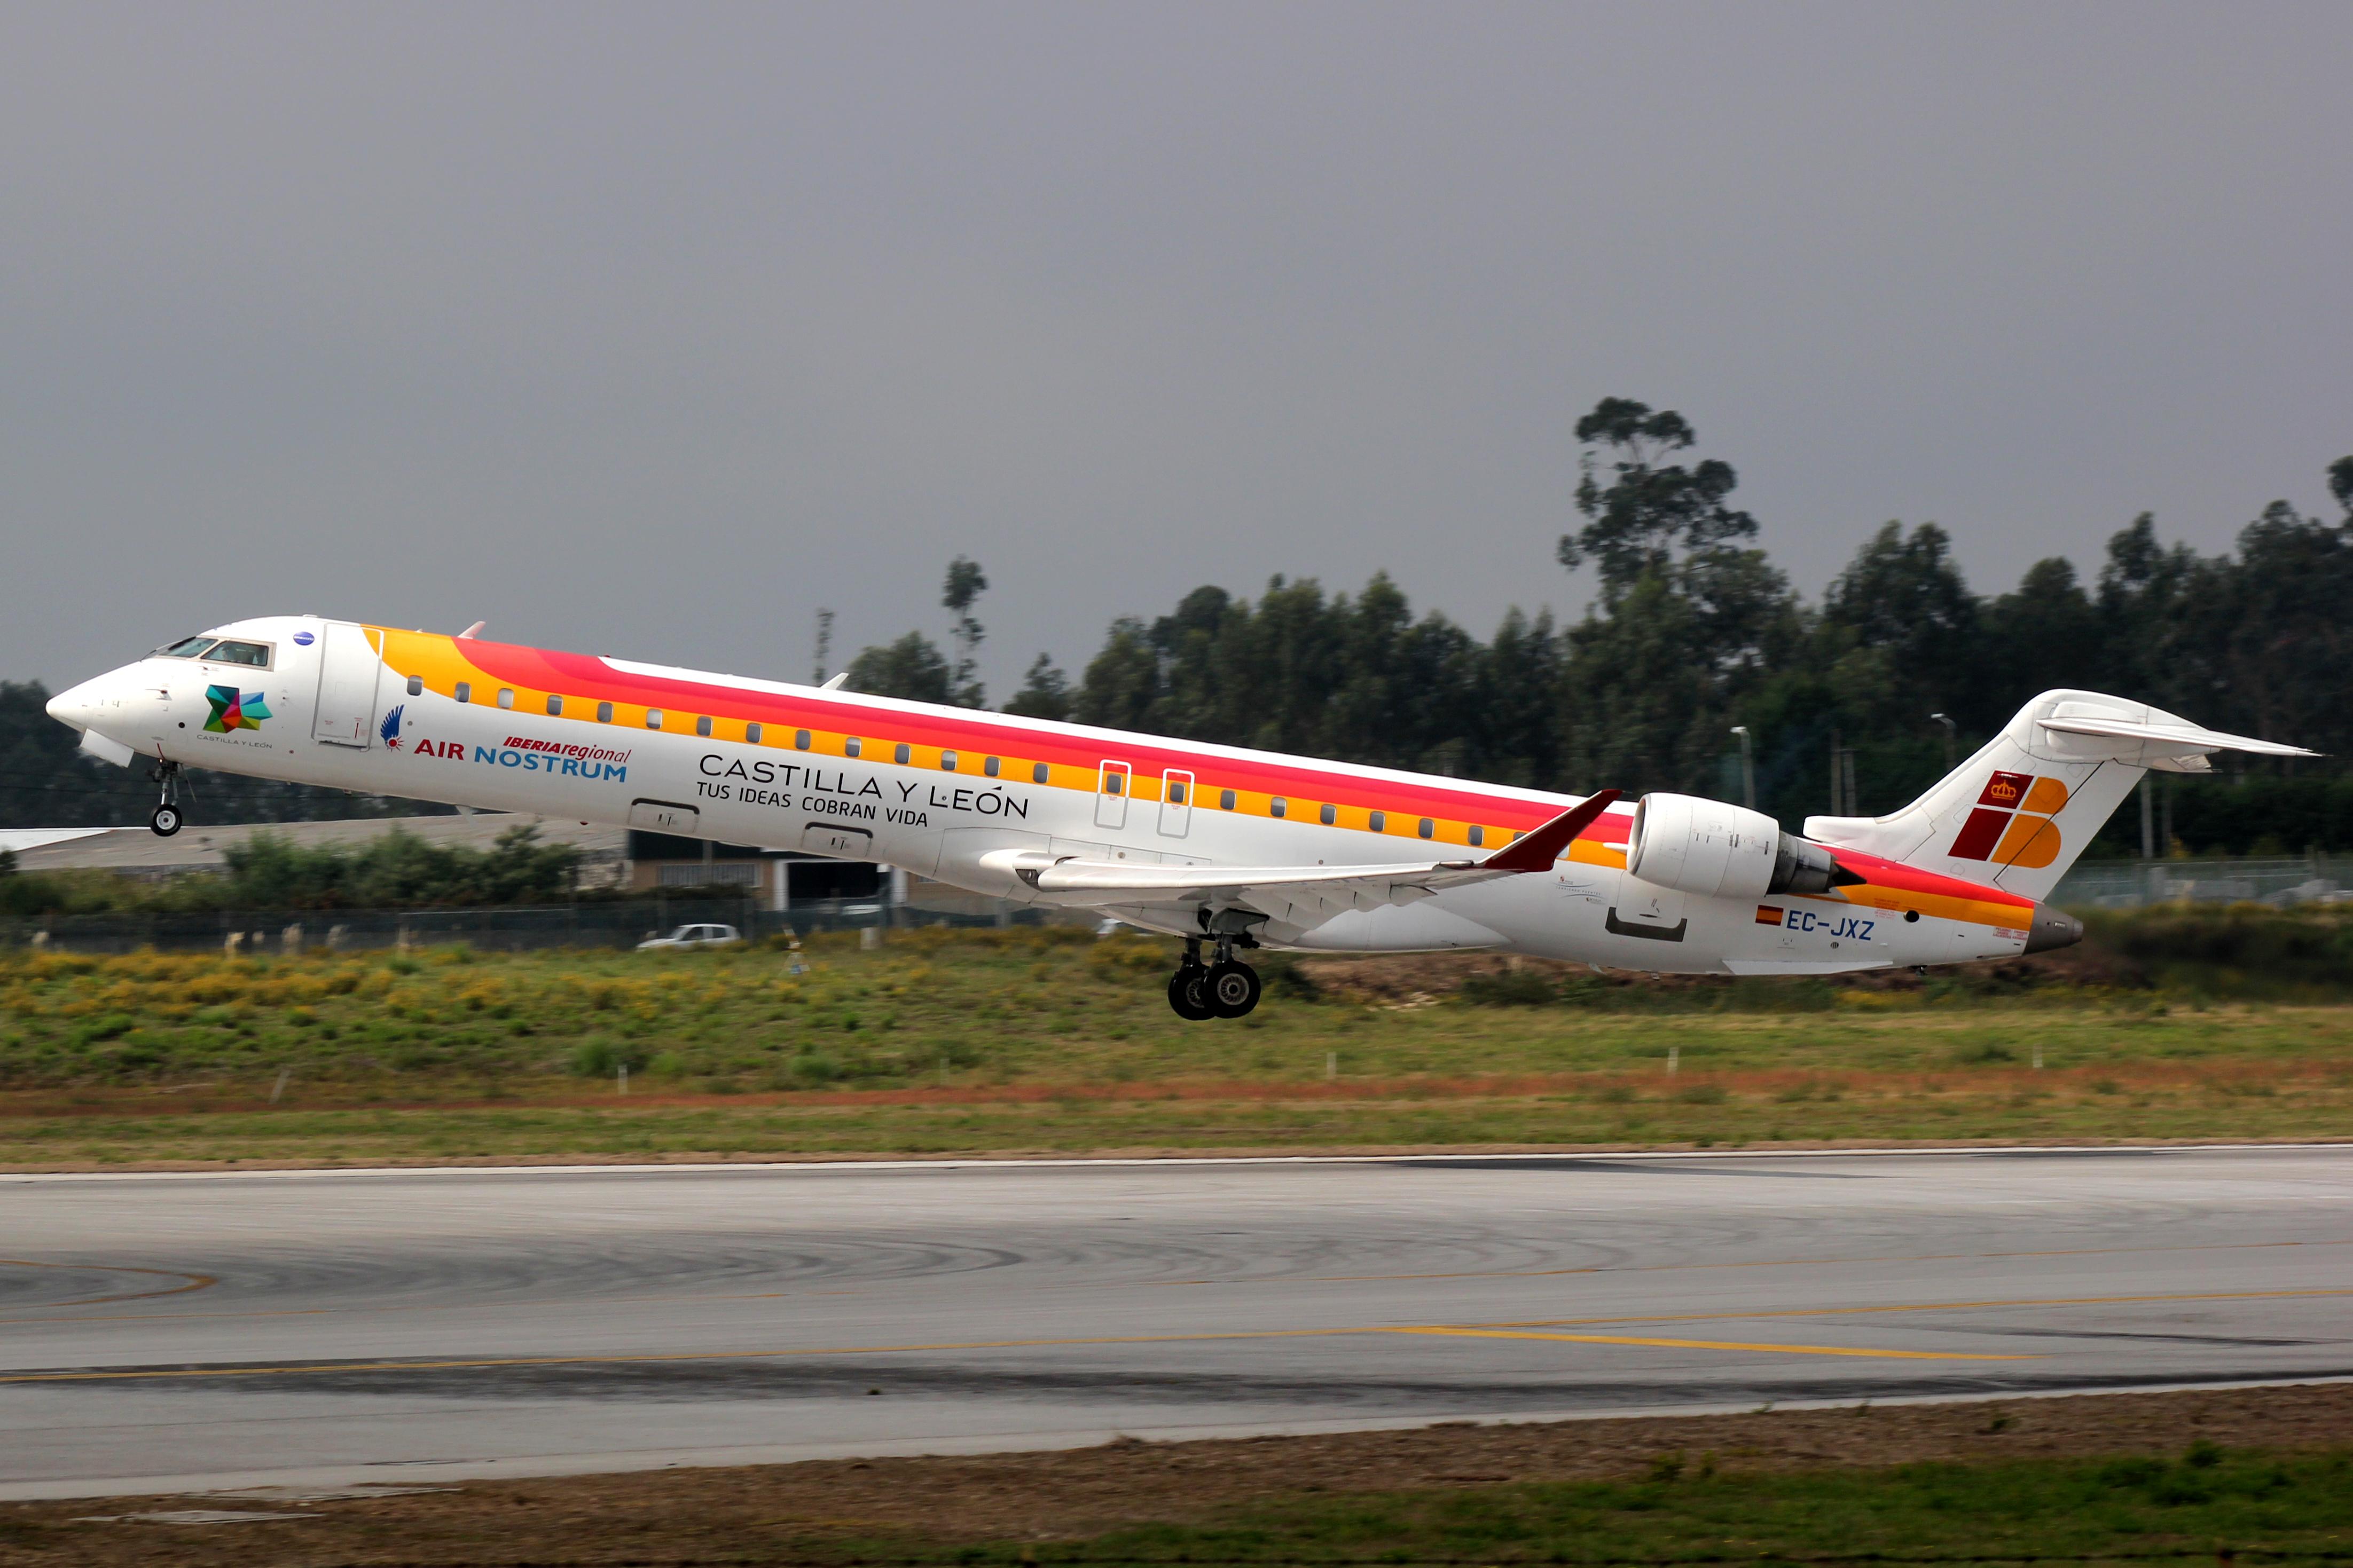 File:CRJ-900 Air Nostrum EC-JXZ 01.jpg - Wikimedia Commons